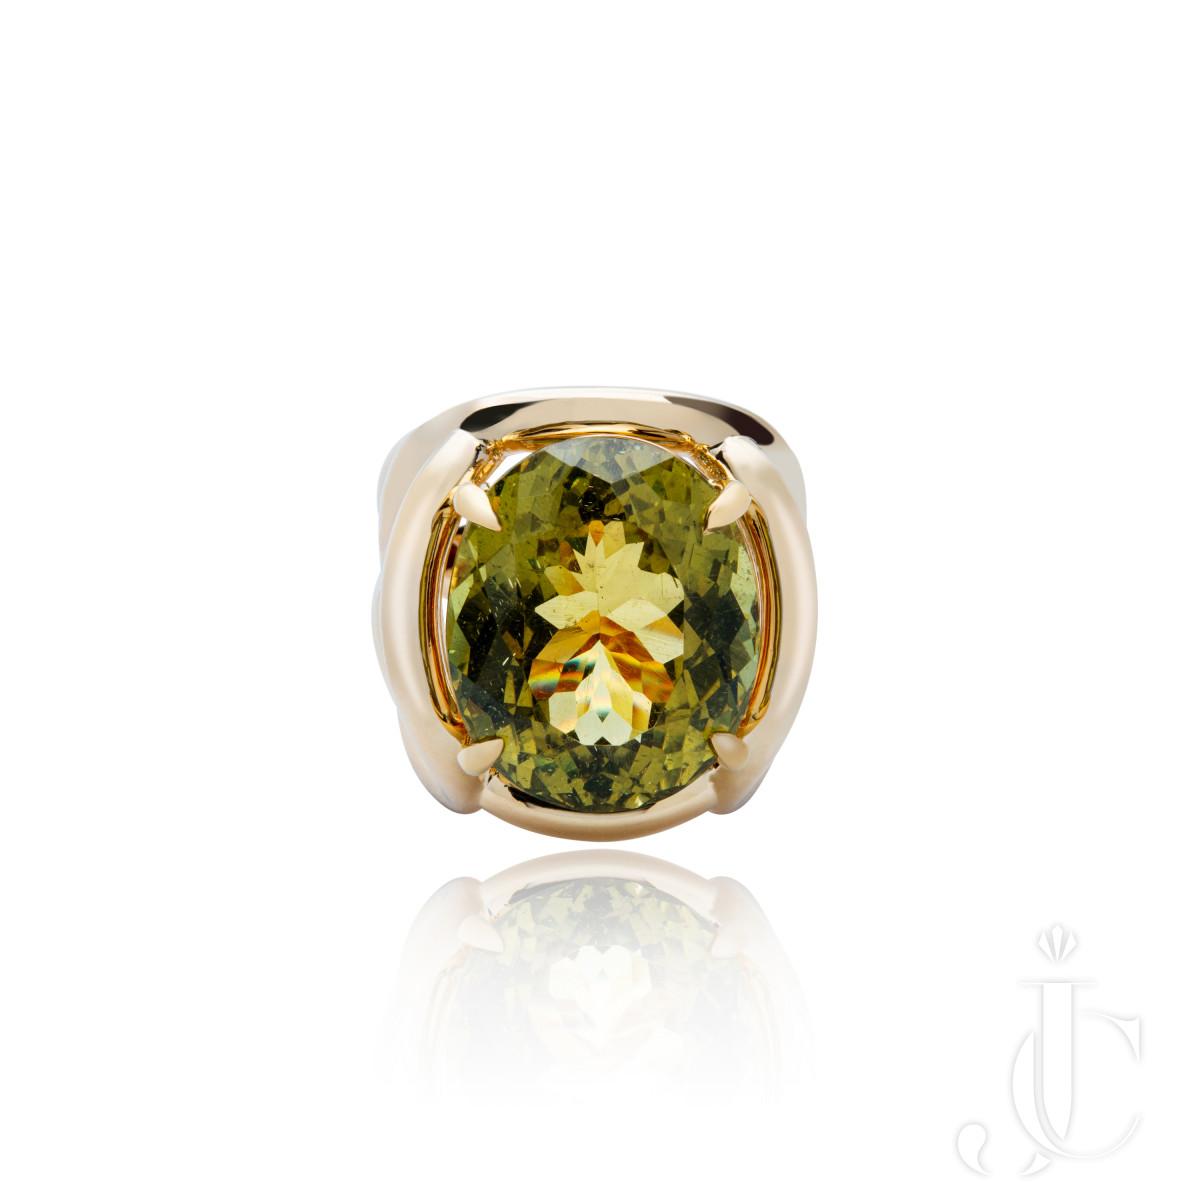 An Order of Bling Apatite Gemstone Cocktail Ring